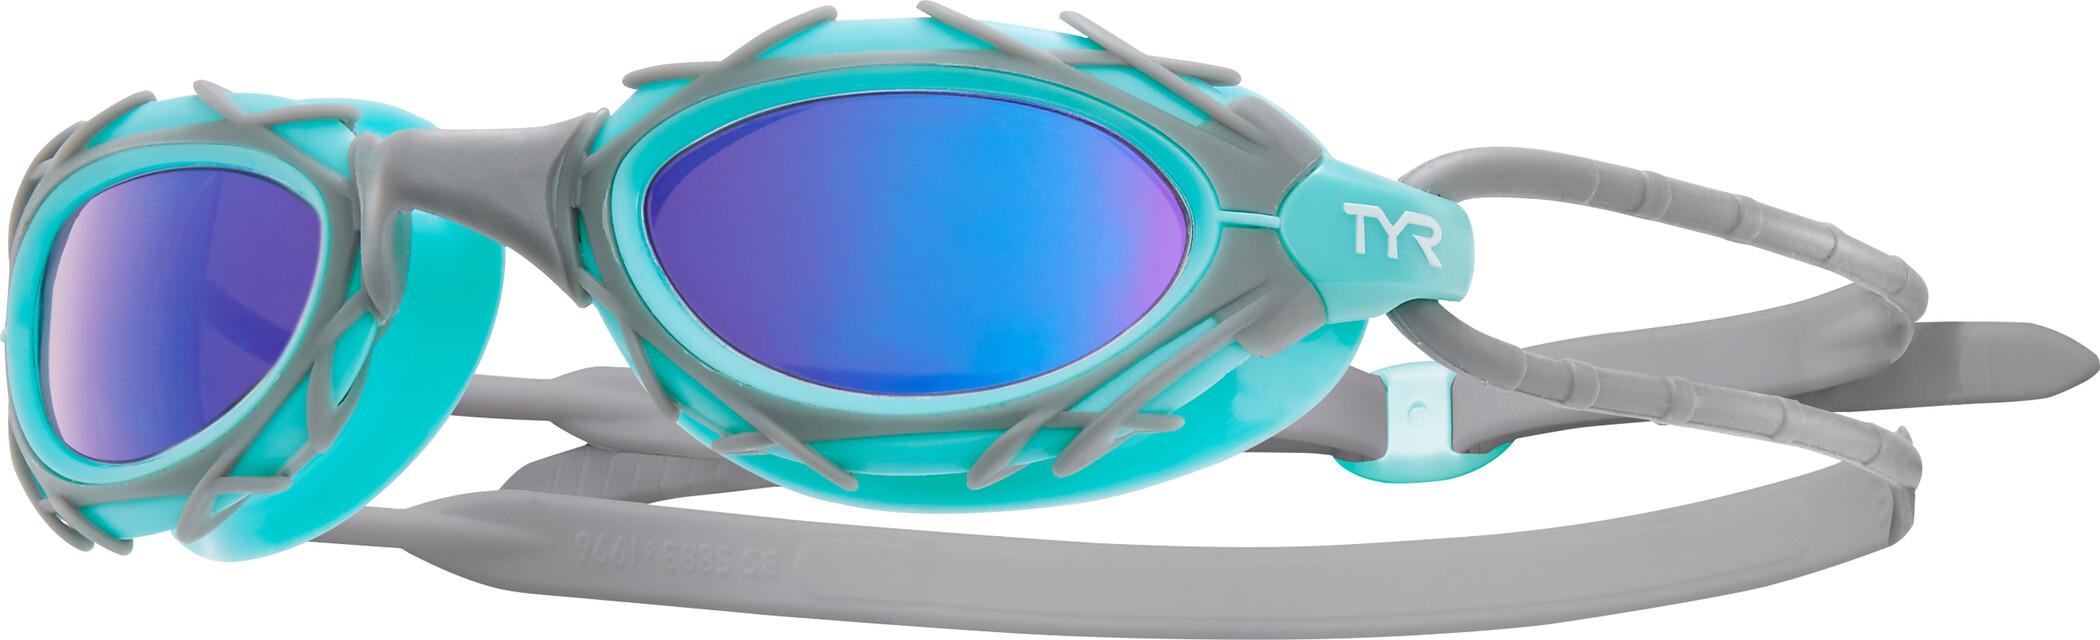 TYR Nest Pro Nano Goggles Metelized, blue/mint (2019) | Glasses